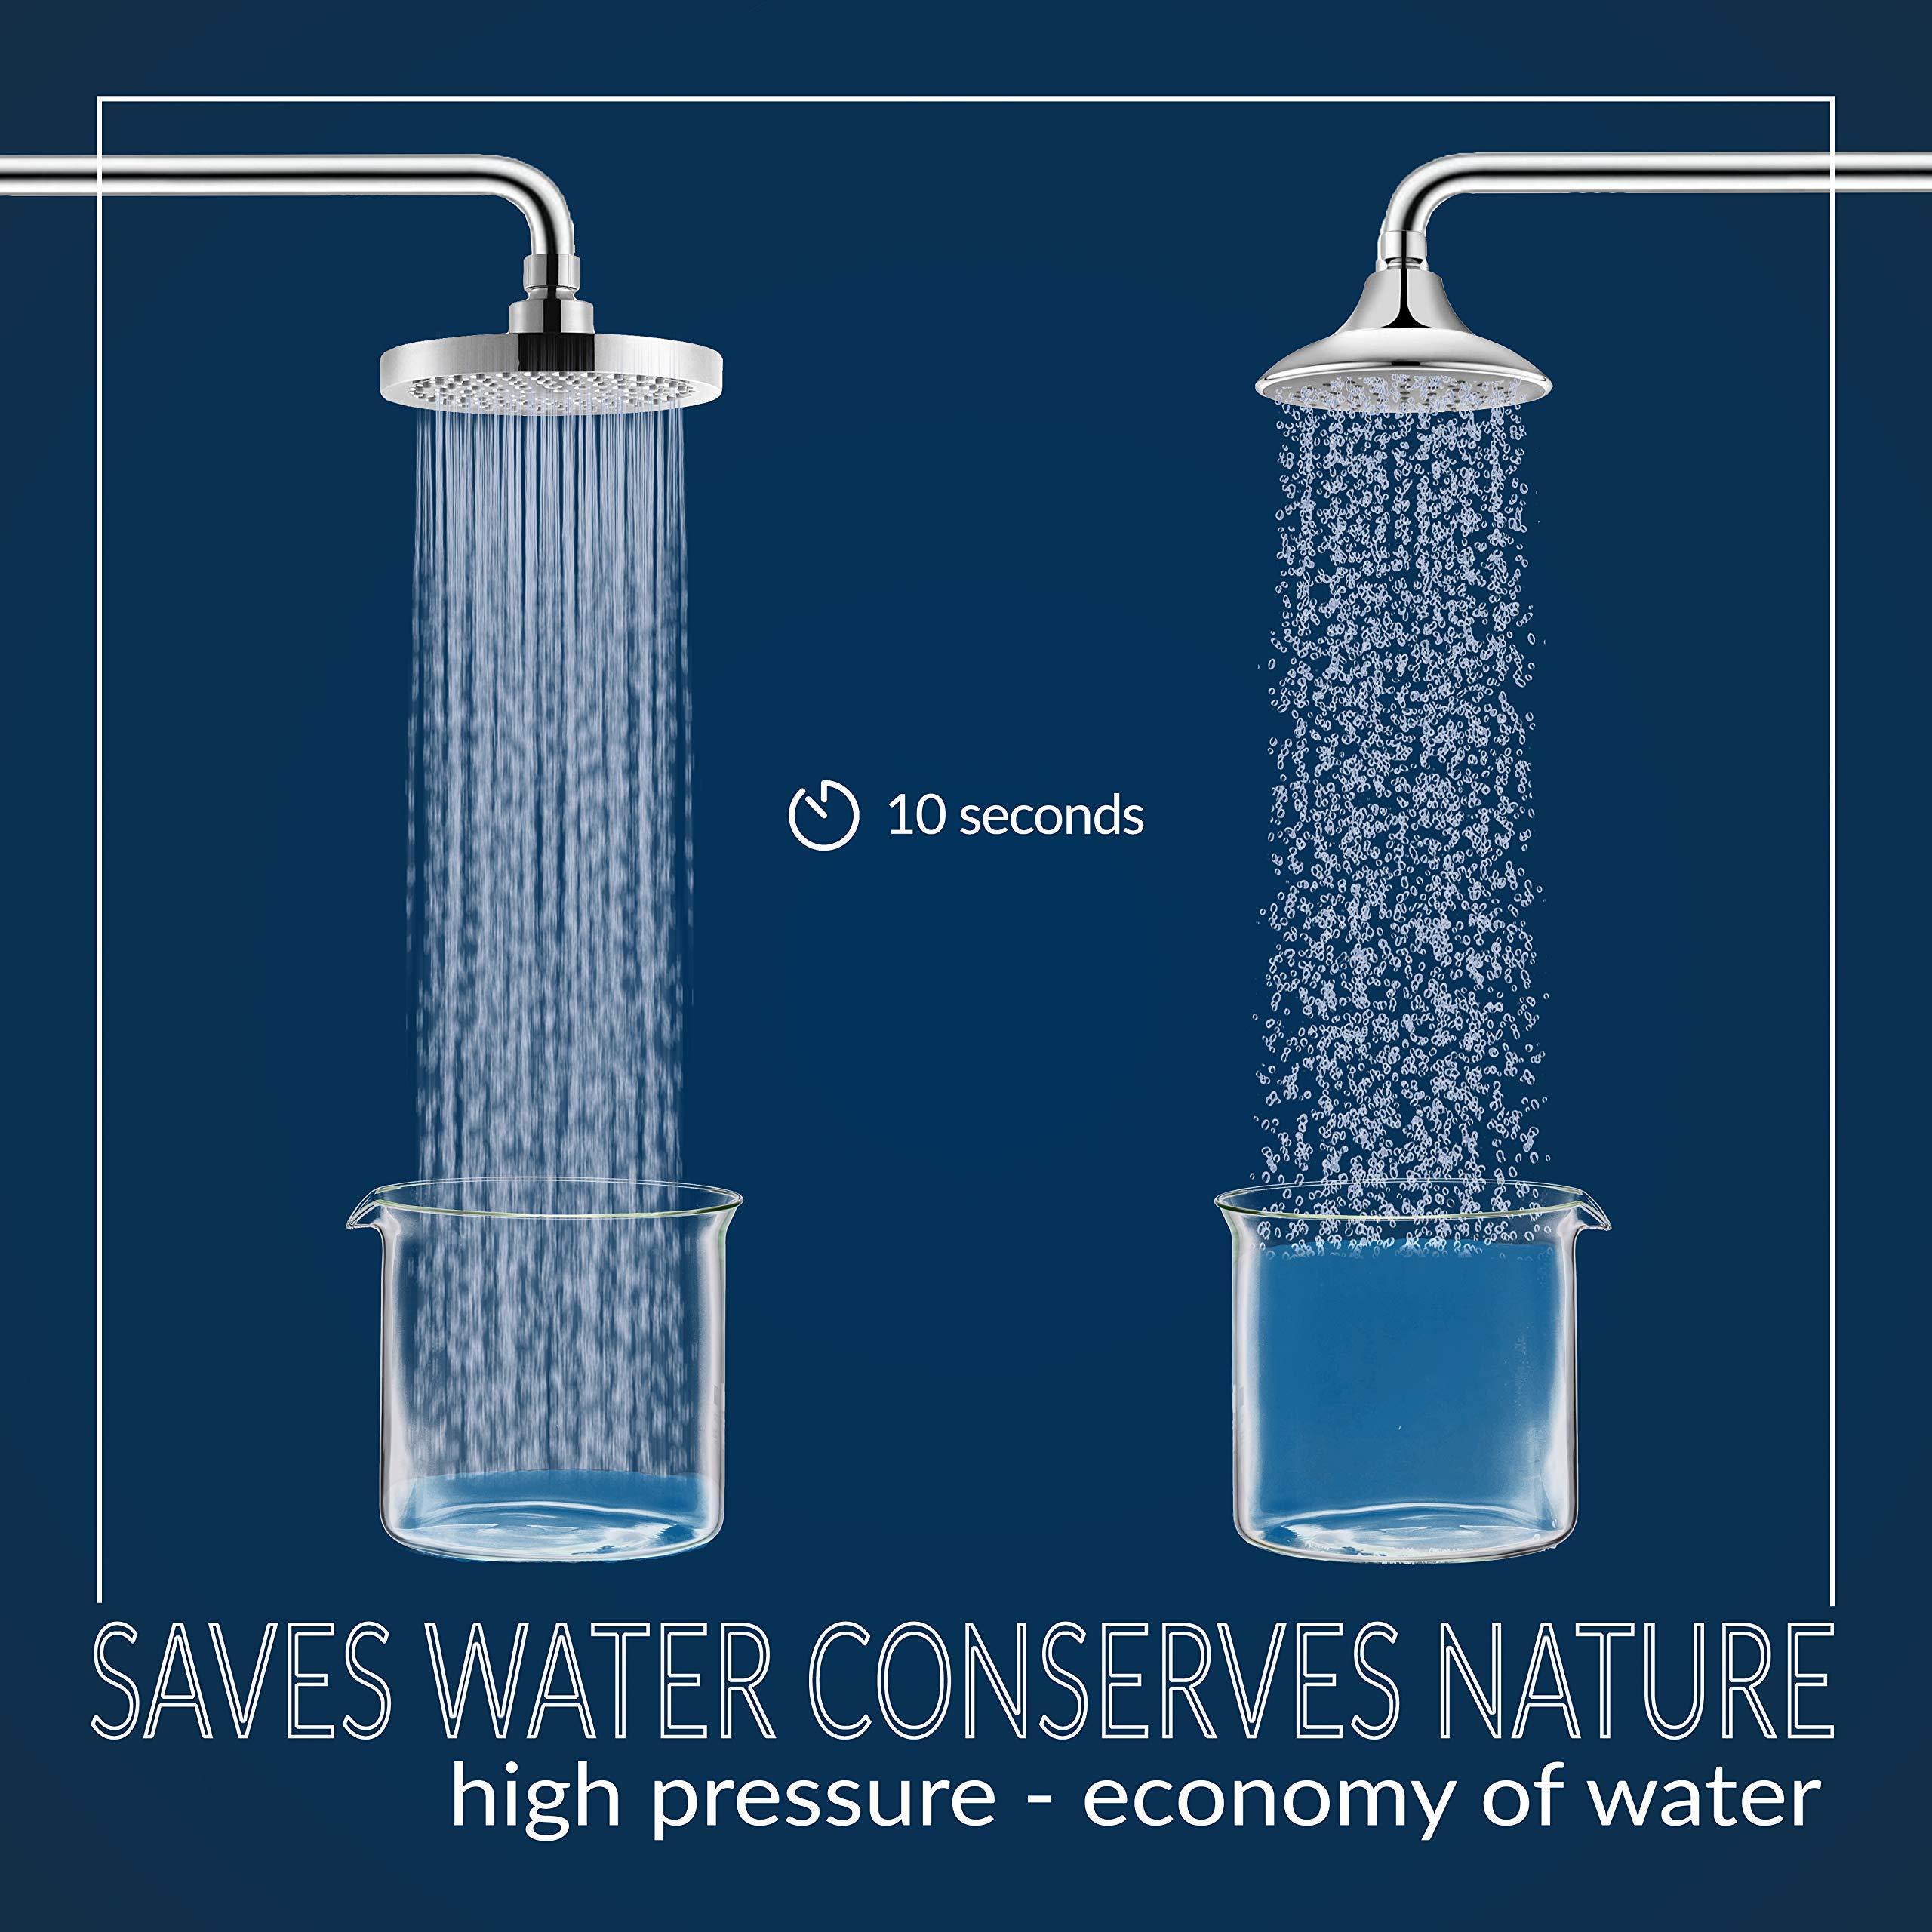 High Pressure  Six Inch  Chrome Appearance  Filter Shower Head - Rainfall  Design Bathroom   Fixtures  for  Waterfall Flow  Effect Showerhead